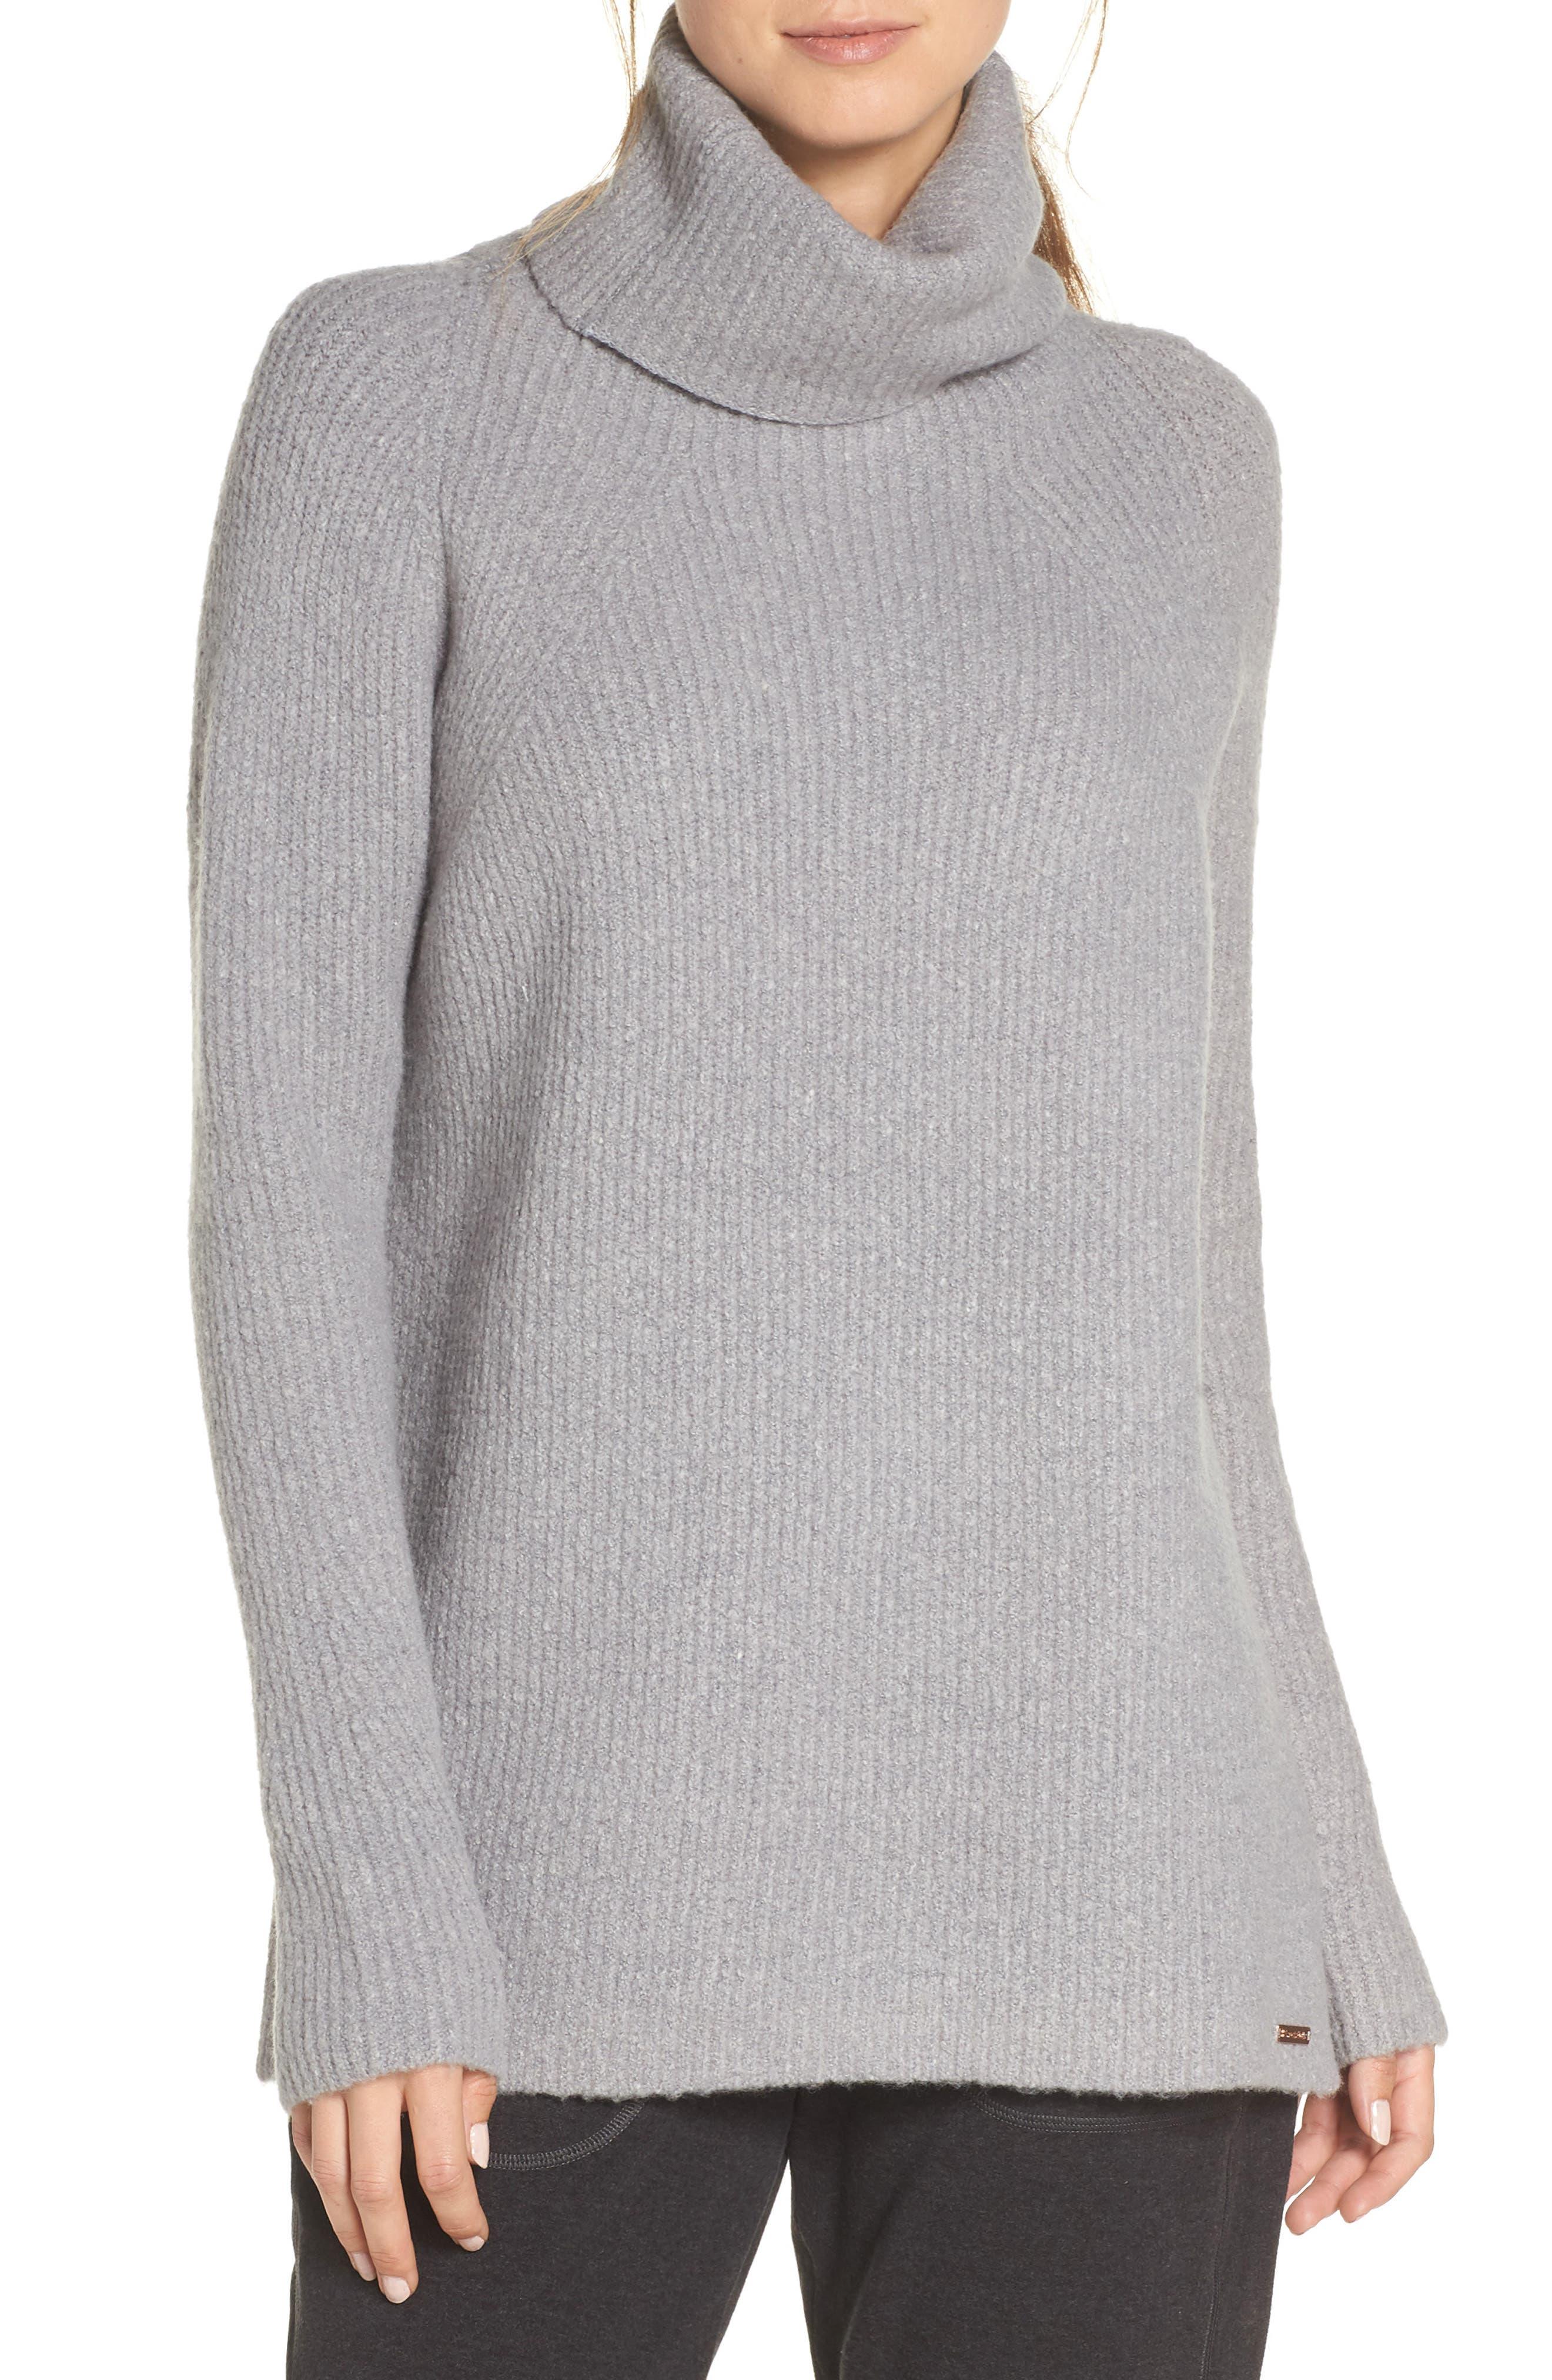 Shakti Oversize Sweater,                         Main,                         color, SILVER GREY MARL